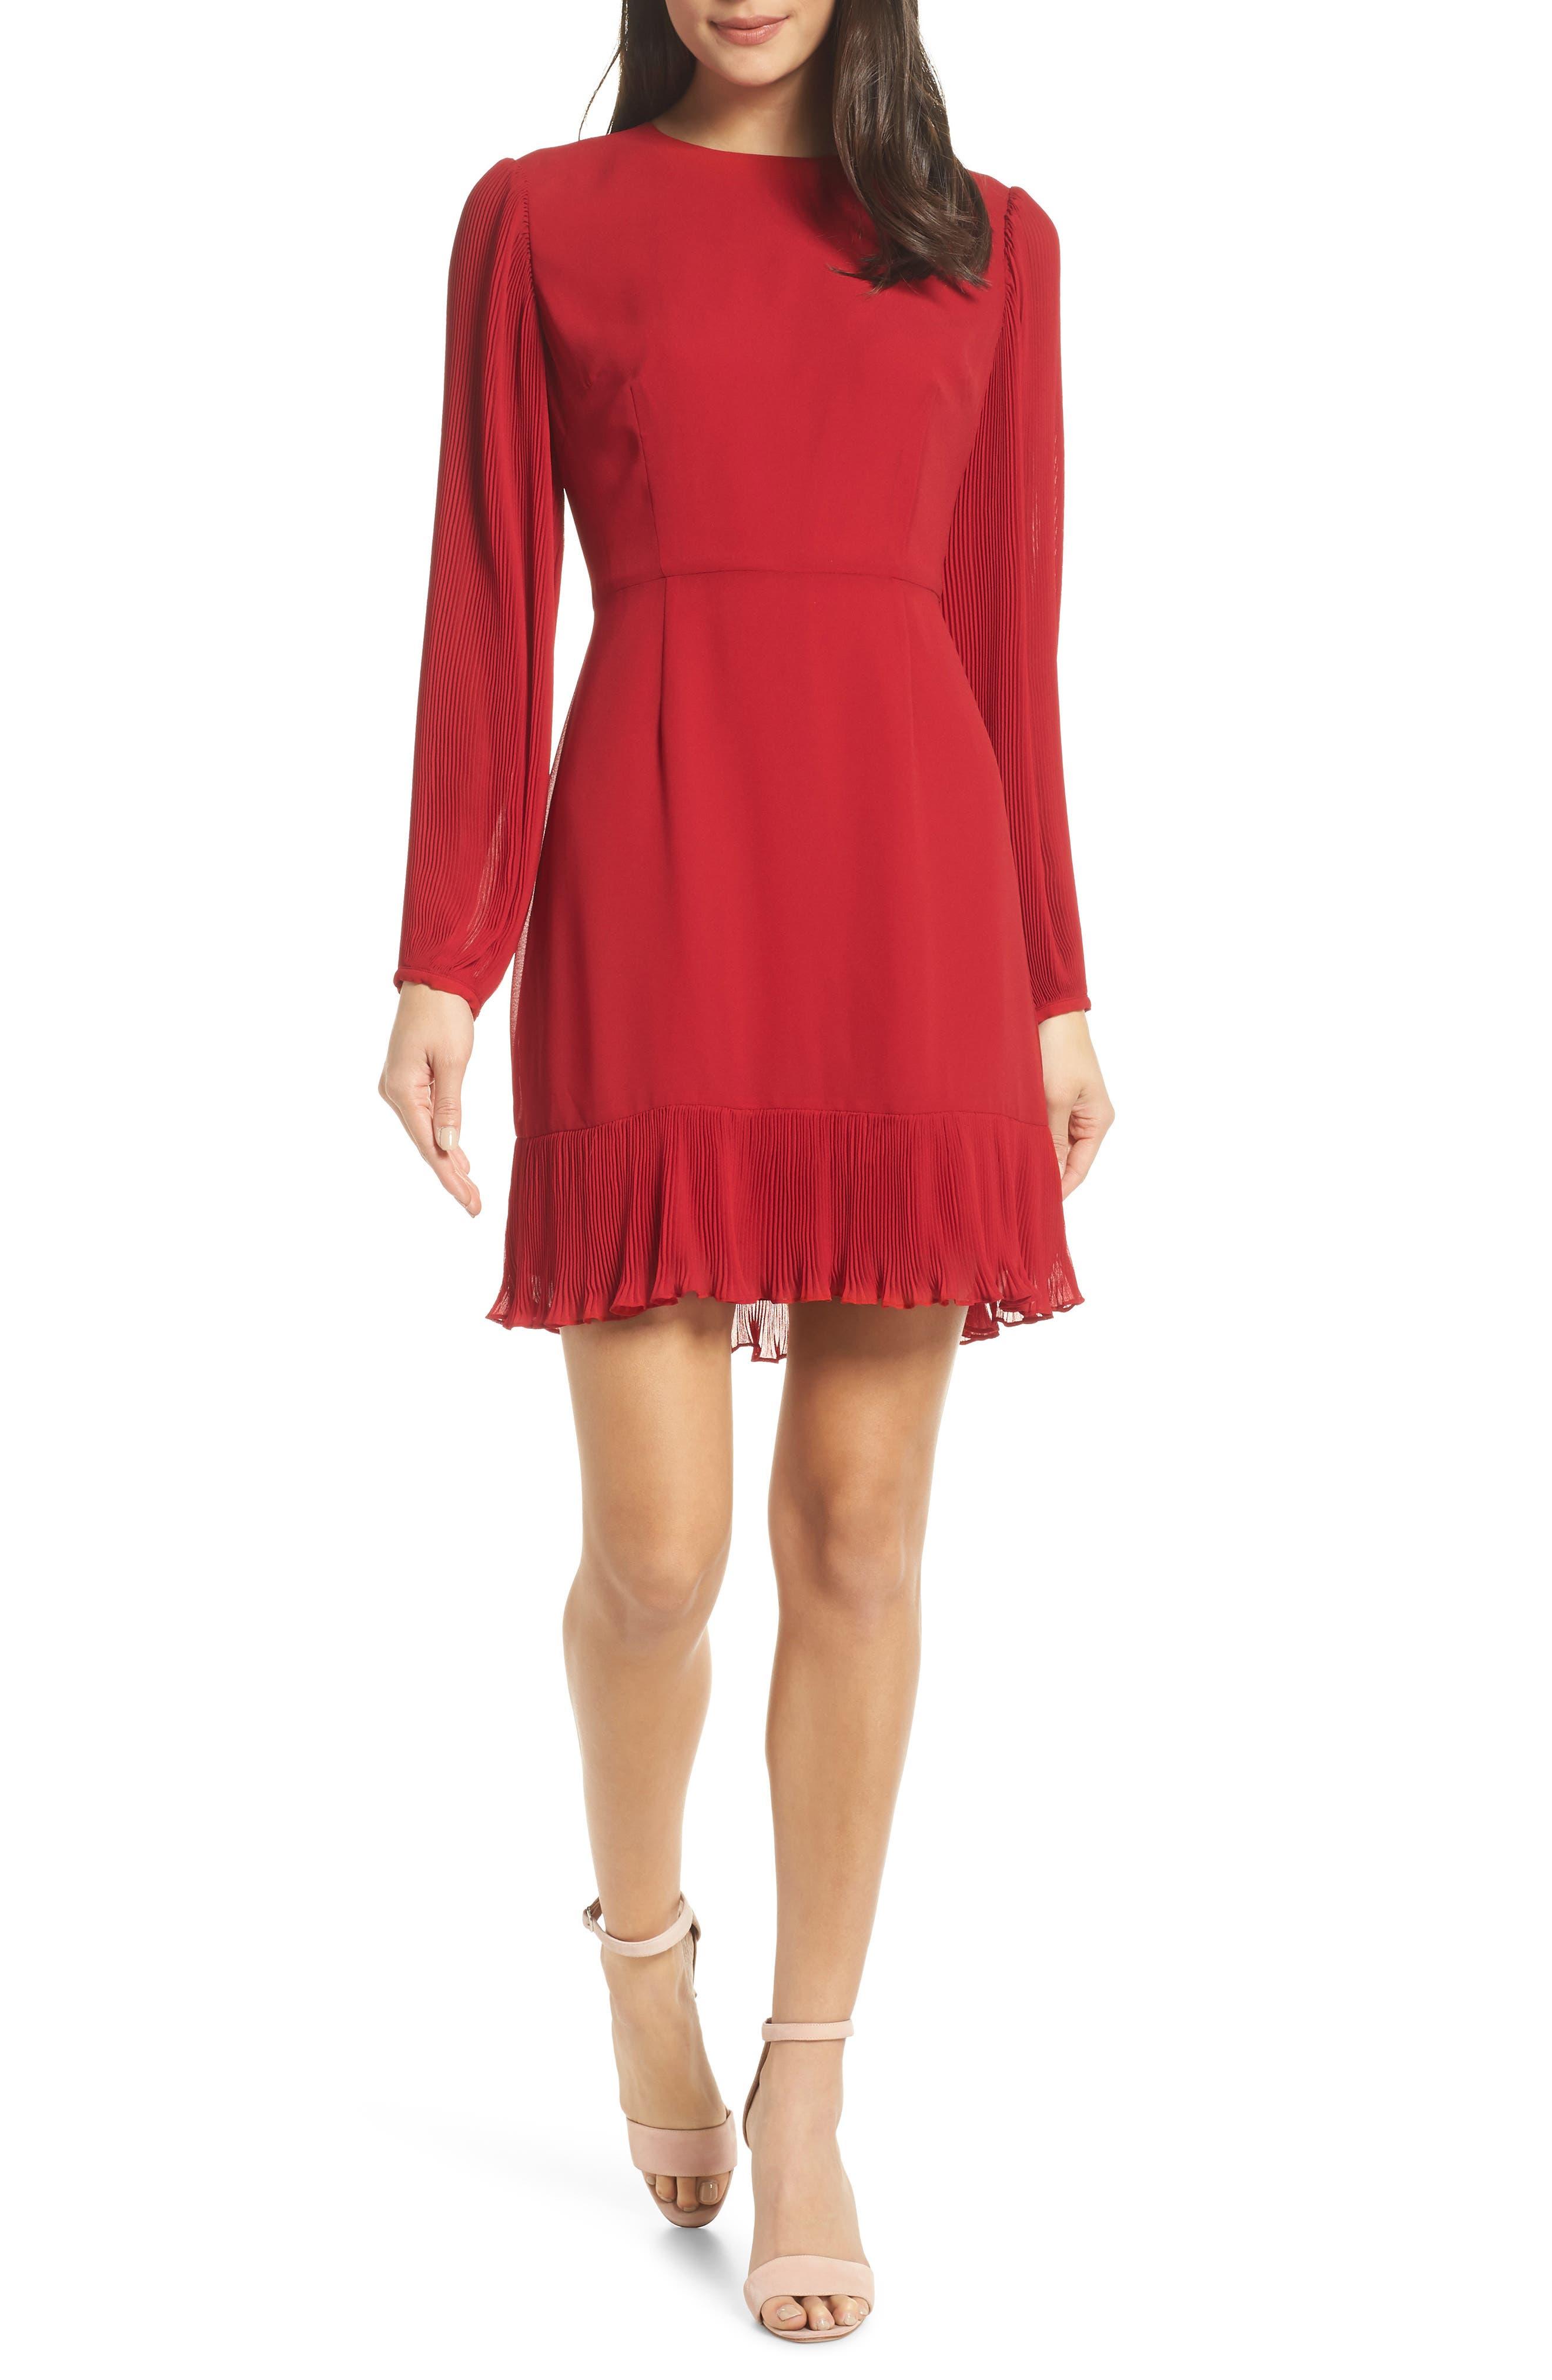 Chelsea28 Pleat Sleeve & Ruffle Hem Dress, Red